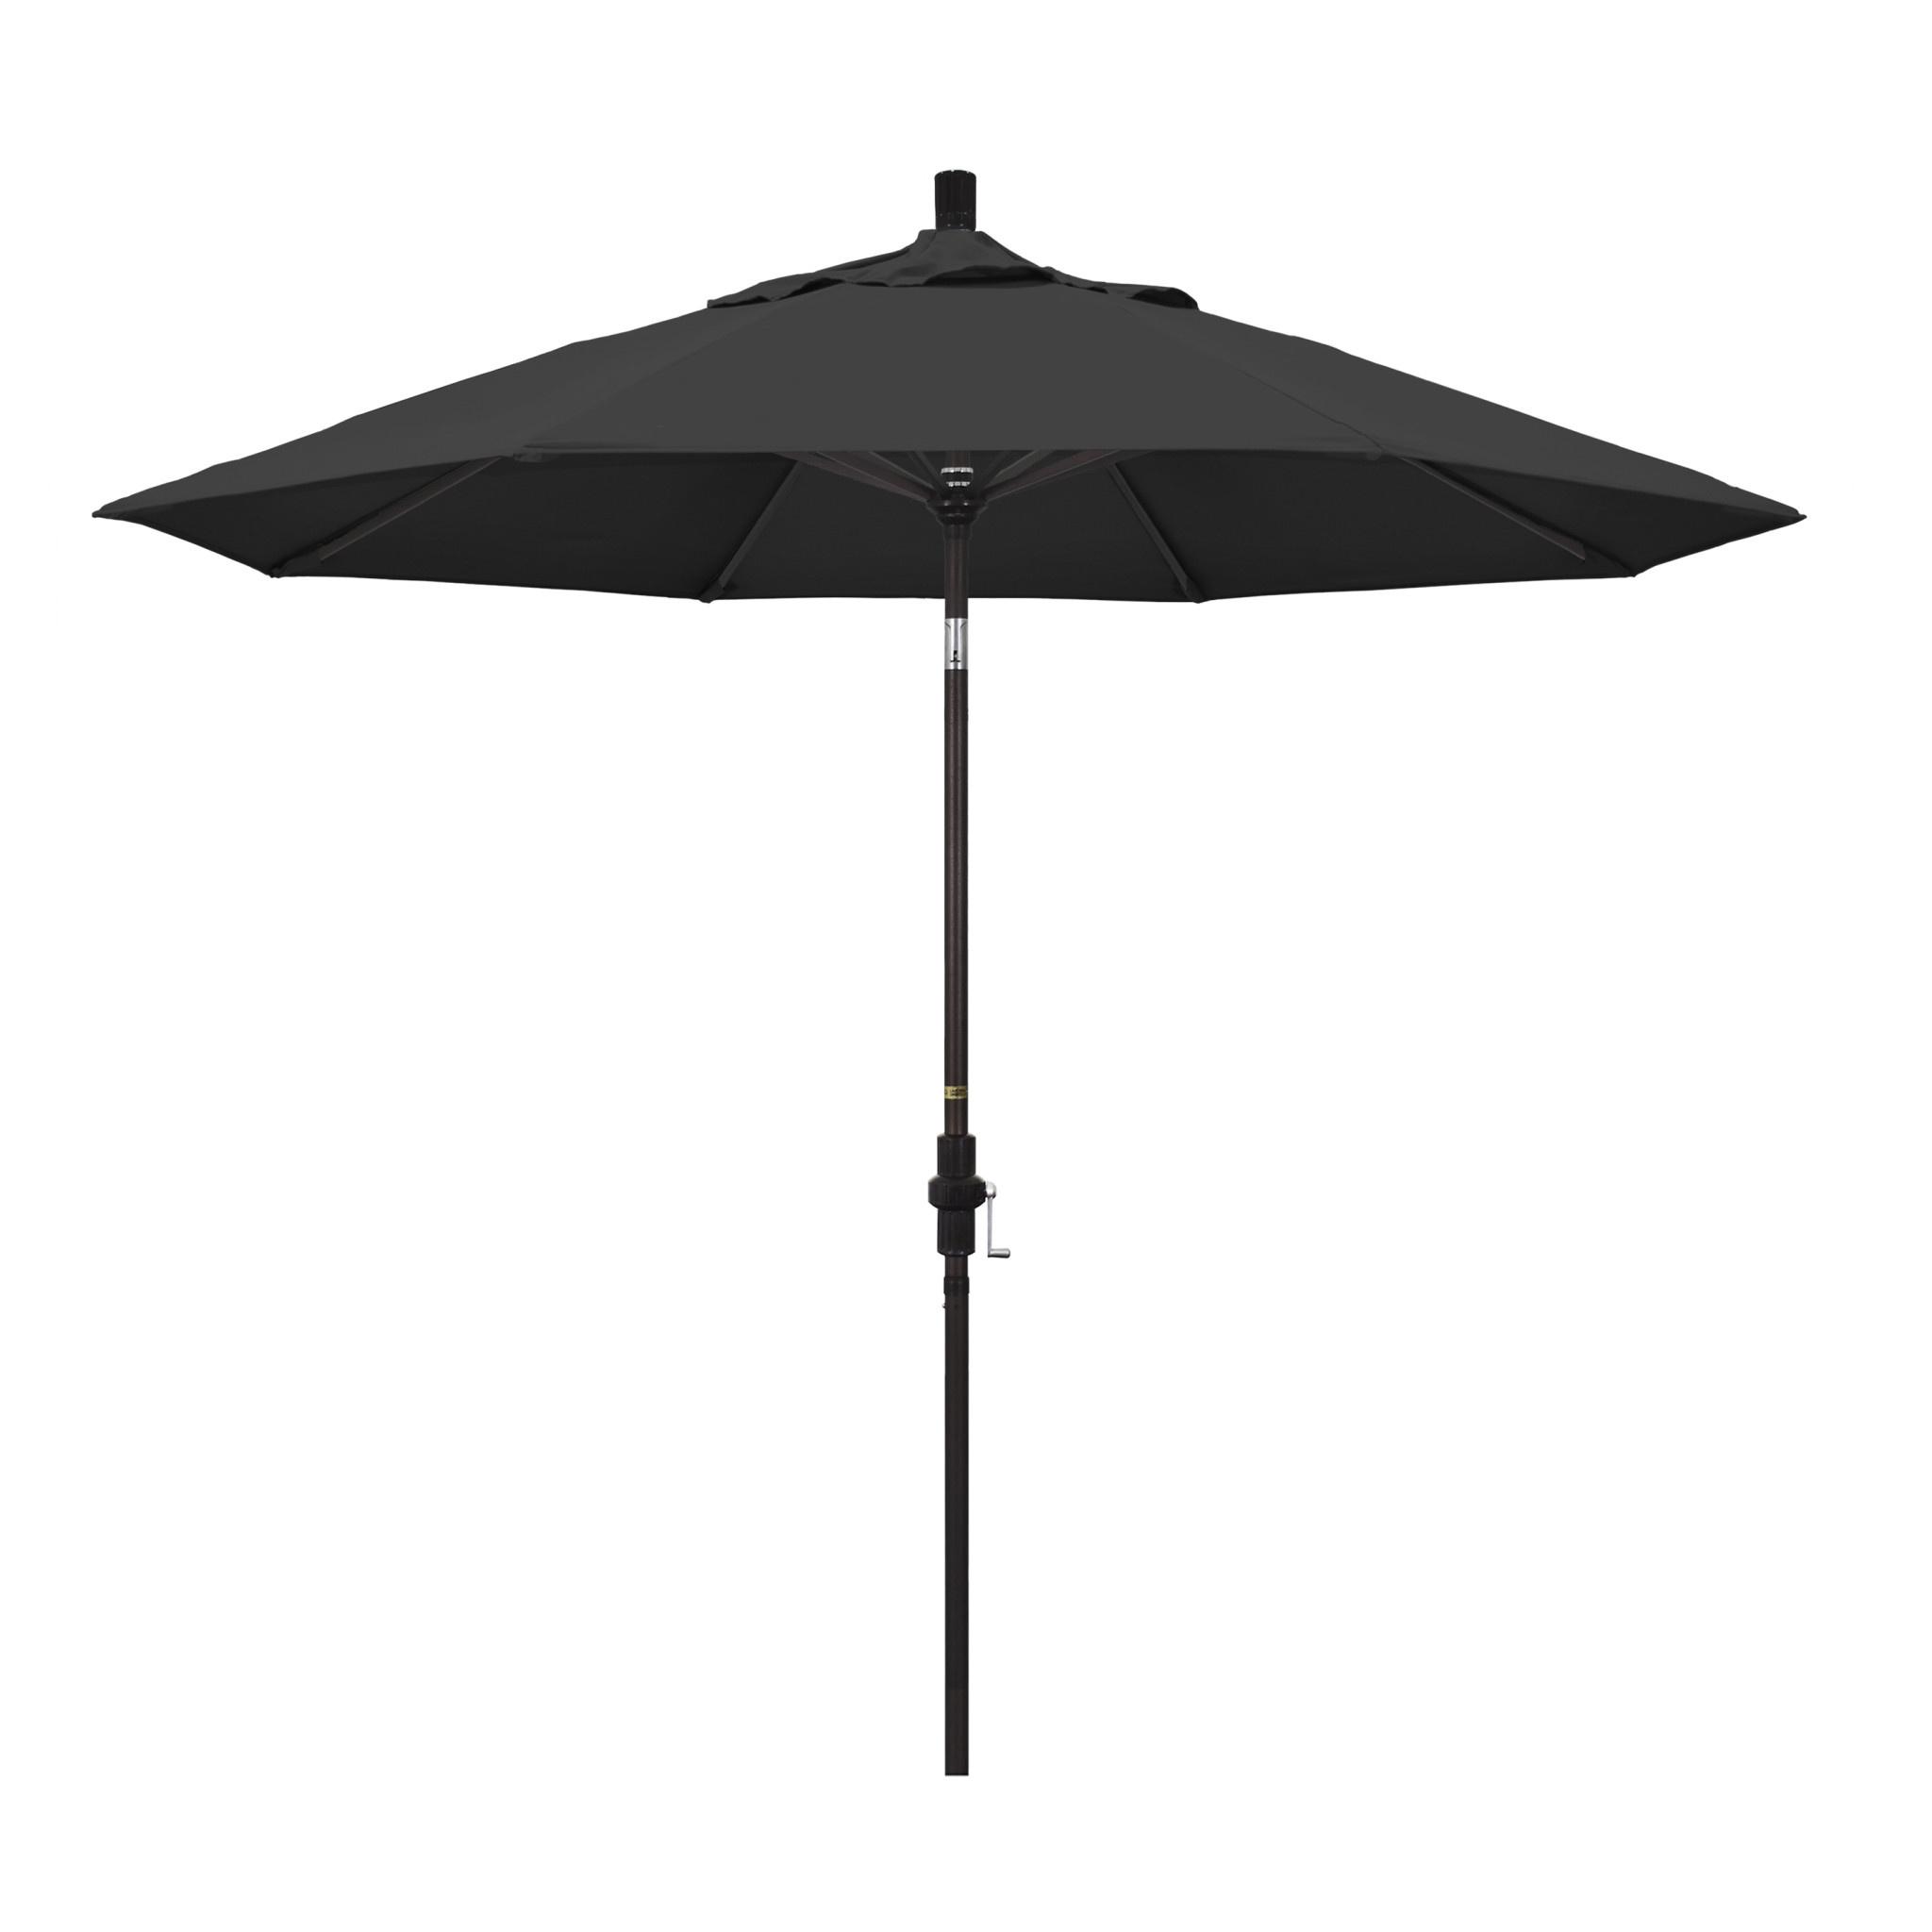 California Umbrella 9' Collar Tilt - Pacifica Black